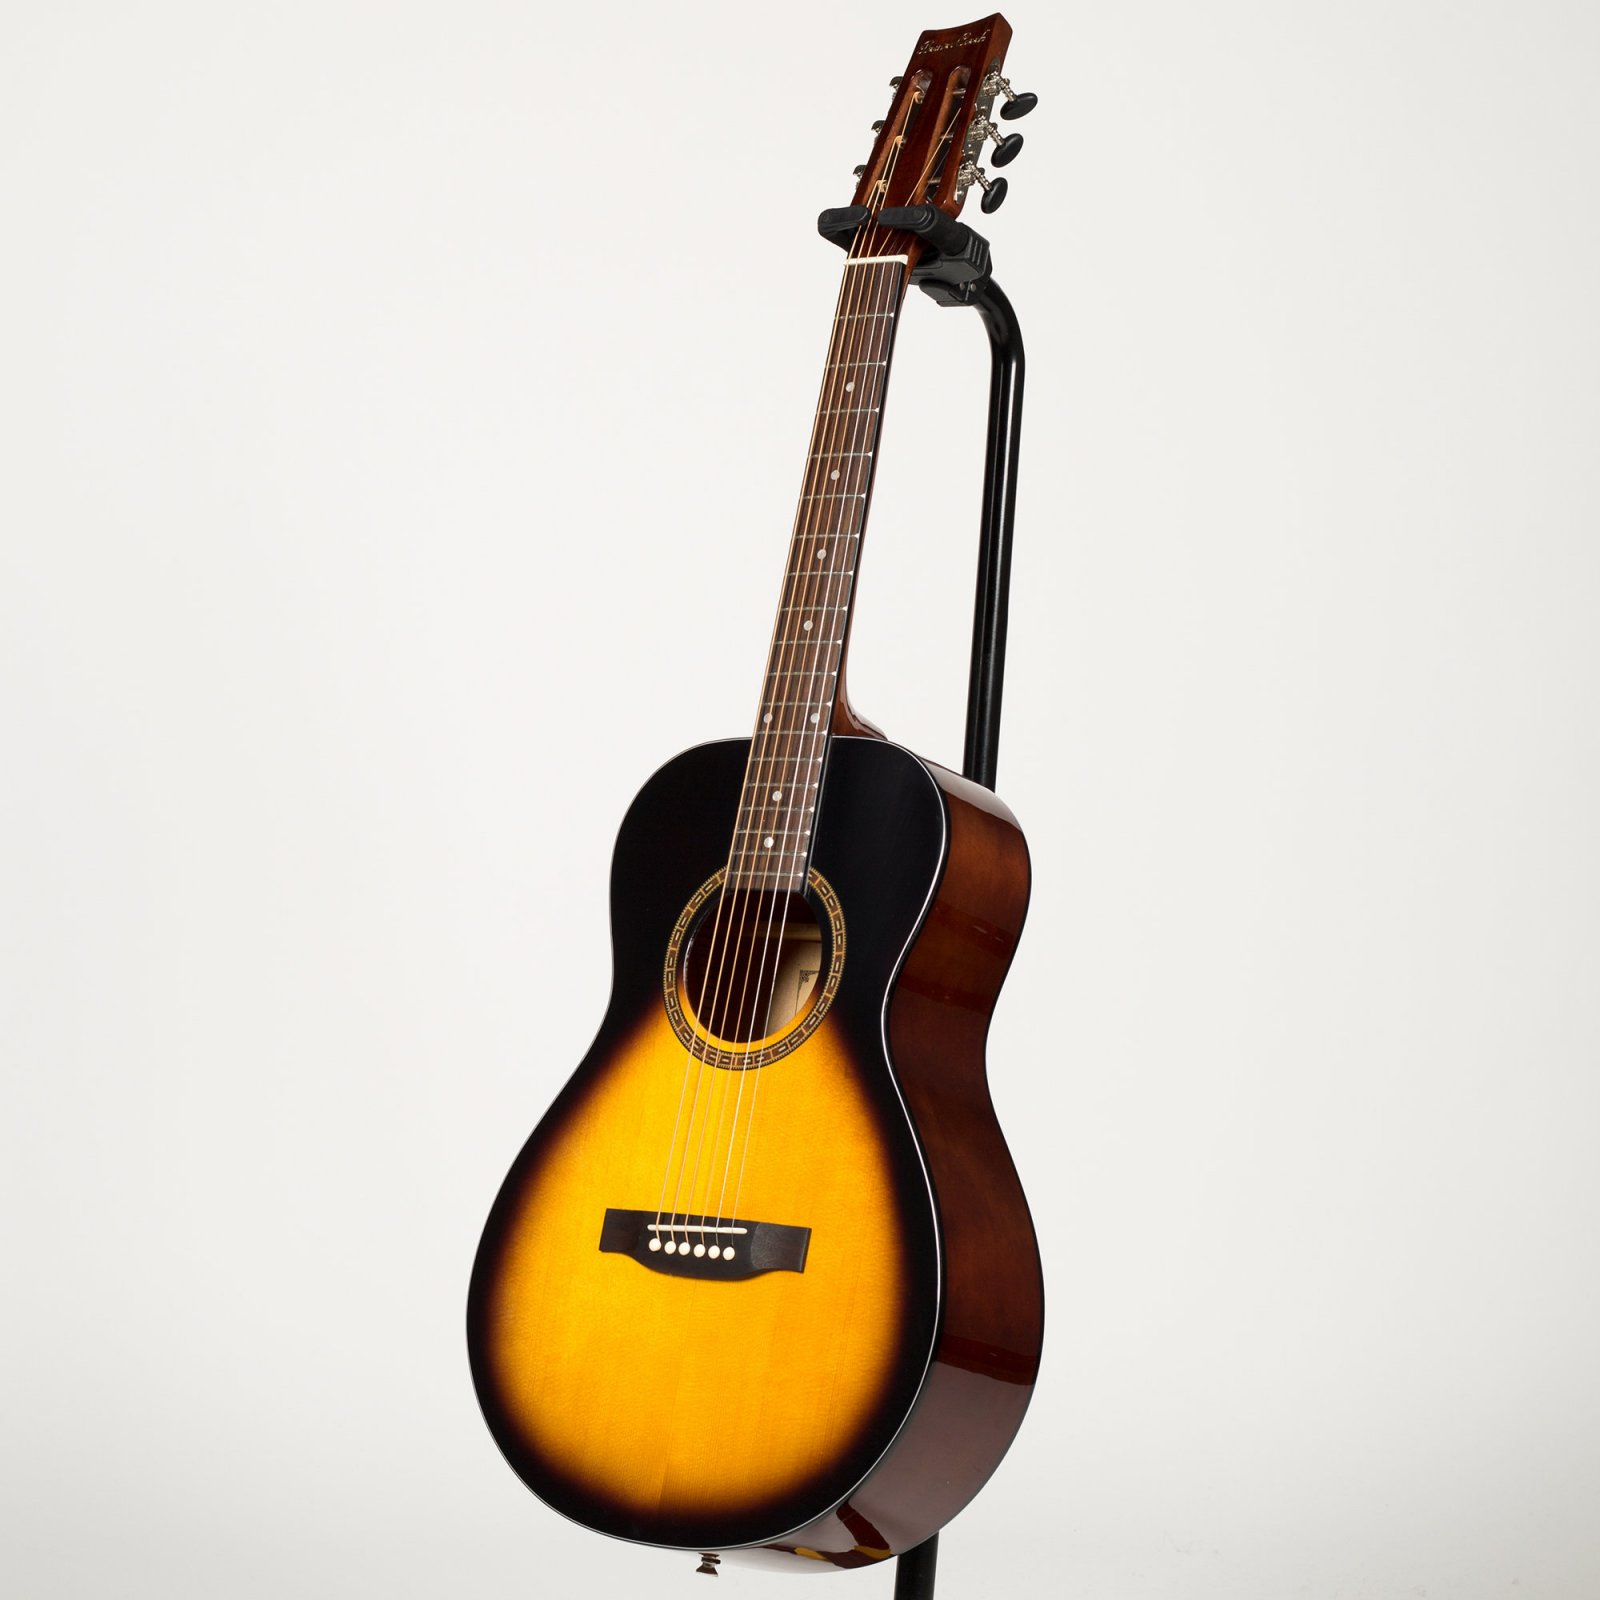 BeaverCreek BCTP101VSB Acoustic Guitar - Vintage Sunburst